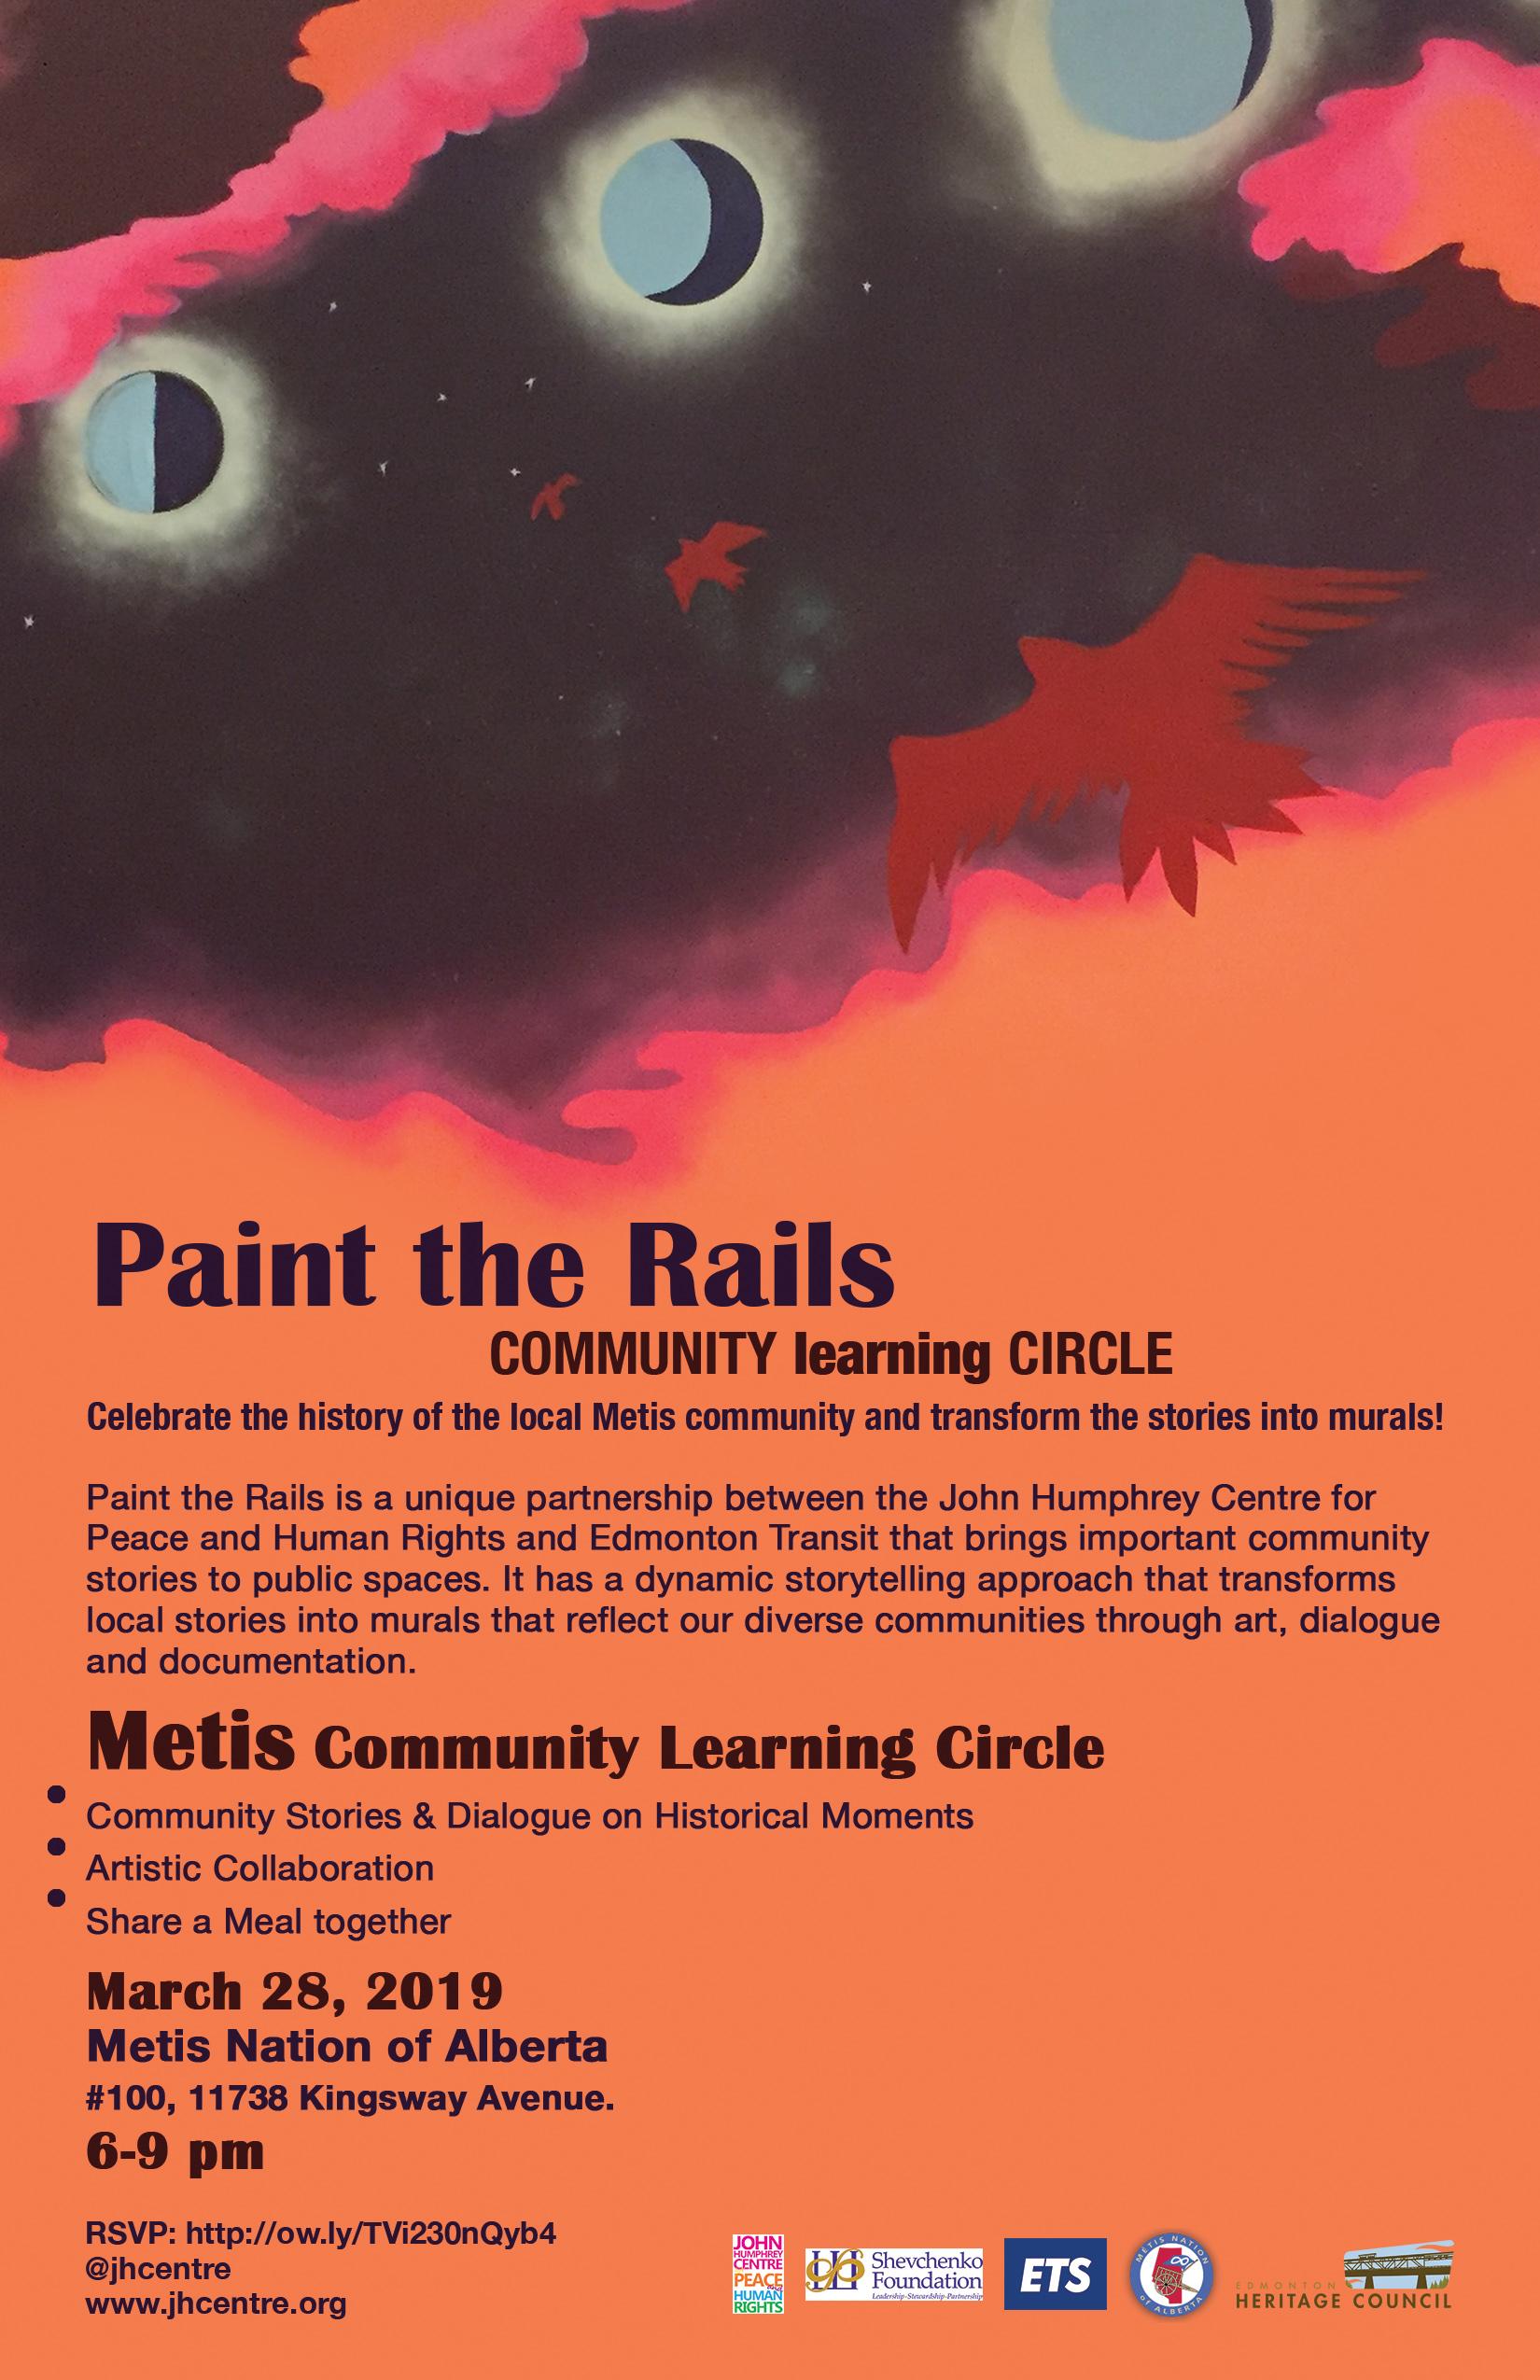 CommunityCircles-PtR-MetisCommunity-Final.jpg